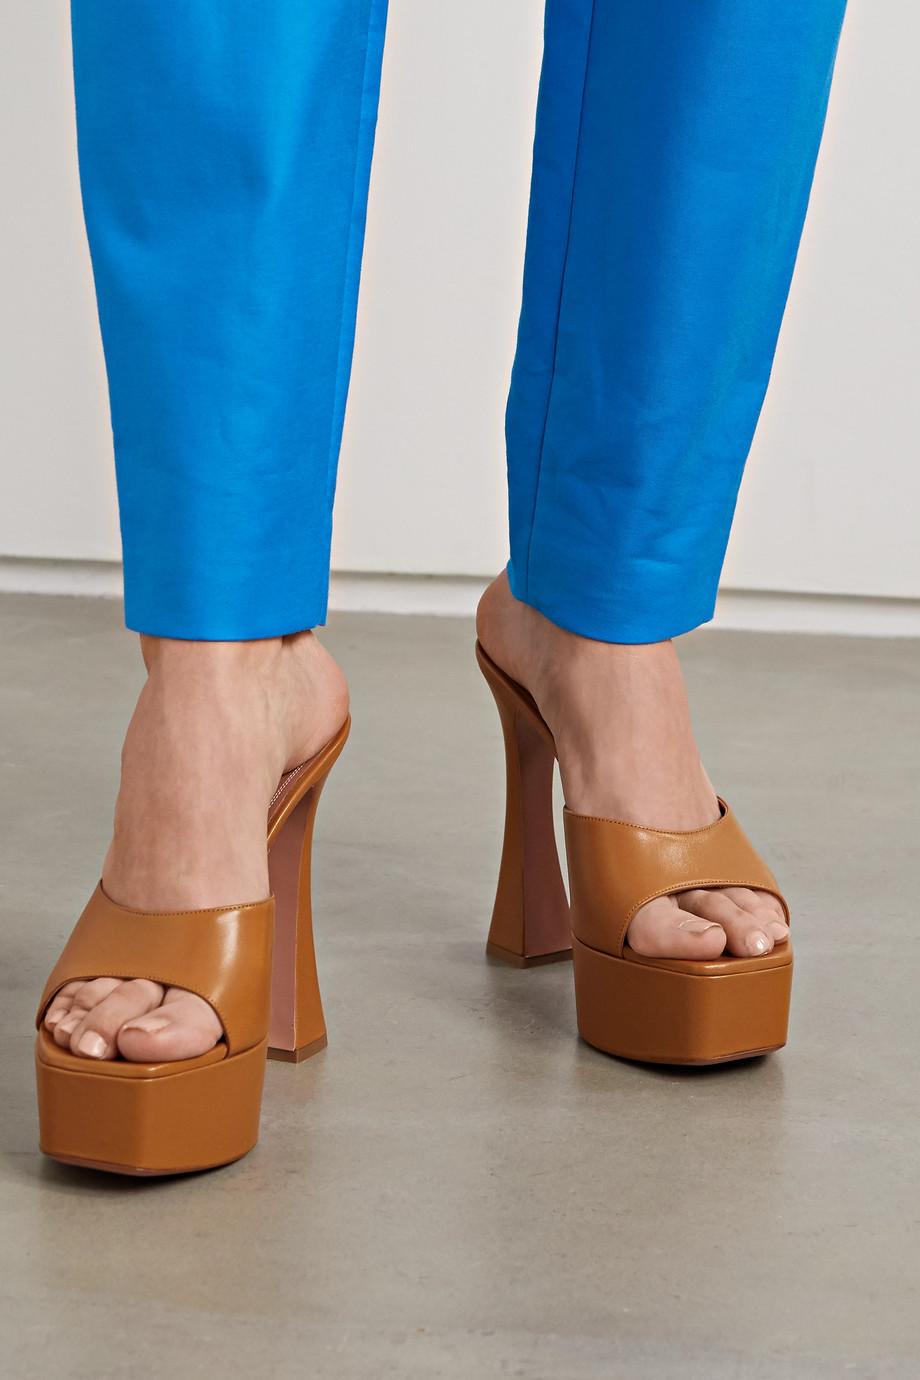 Amina Muaddi Dalida leather platform mules